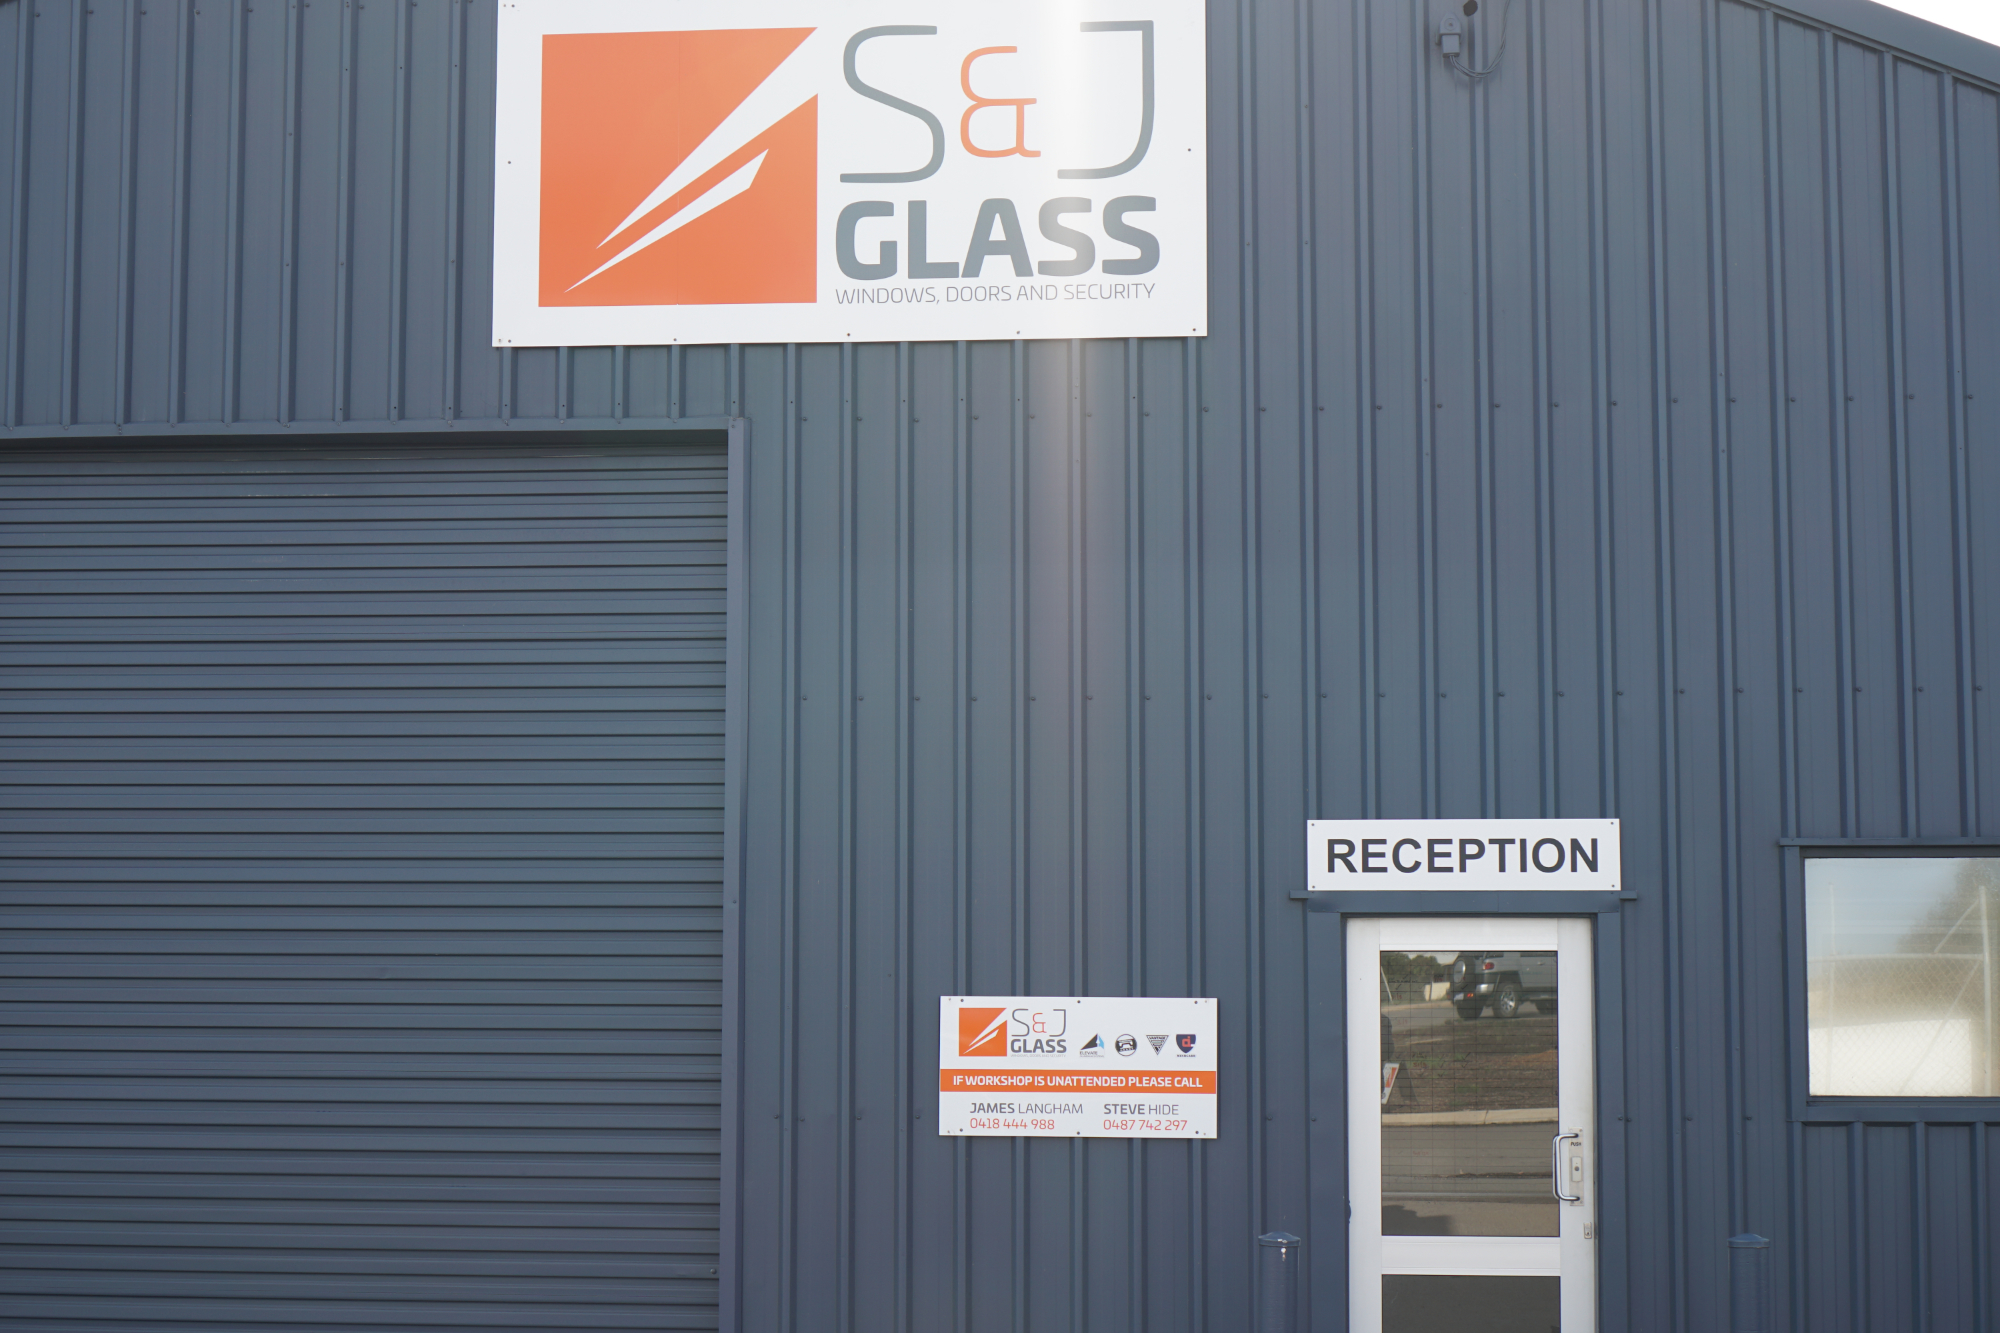 S & J Glass Office Geraldton